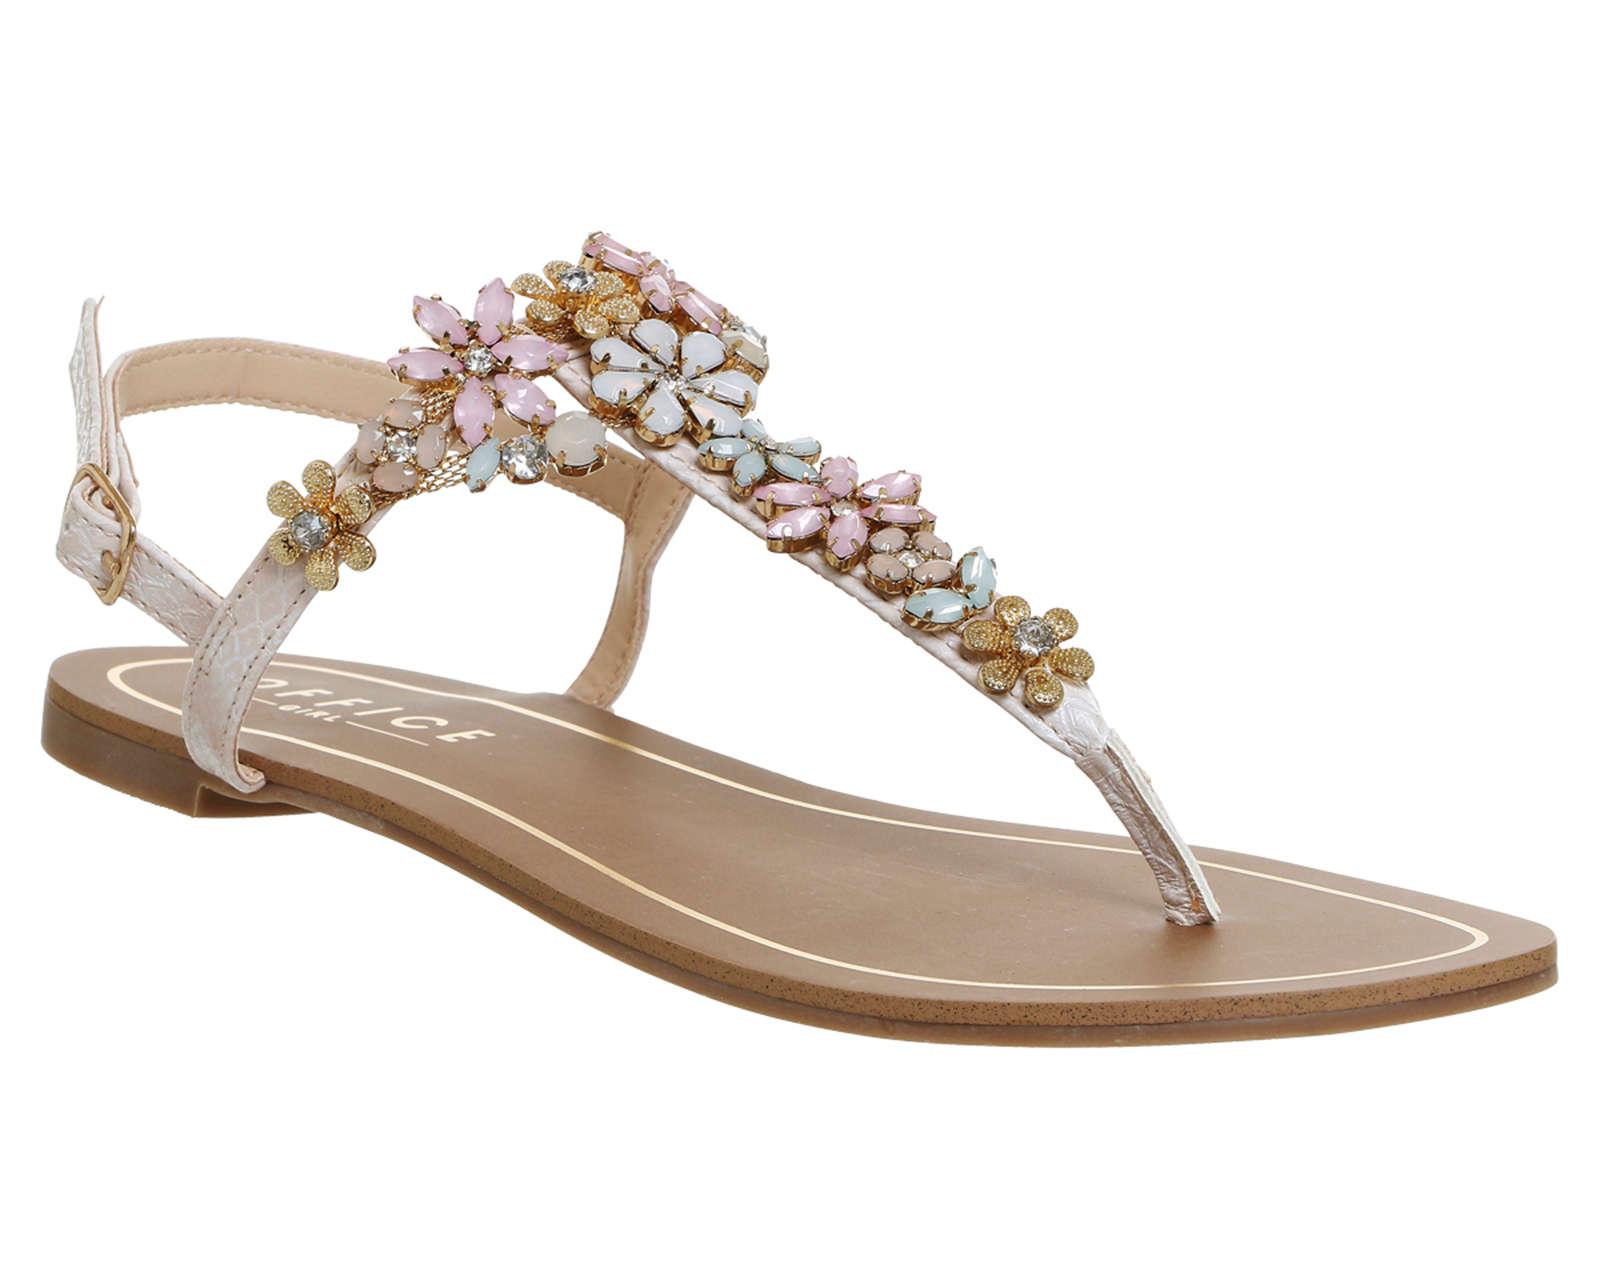 Office Serena sandals £42